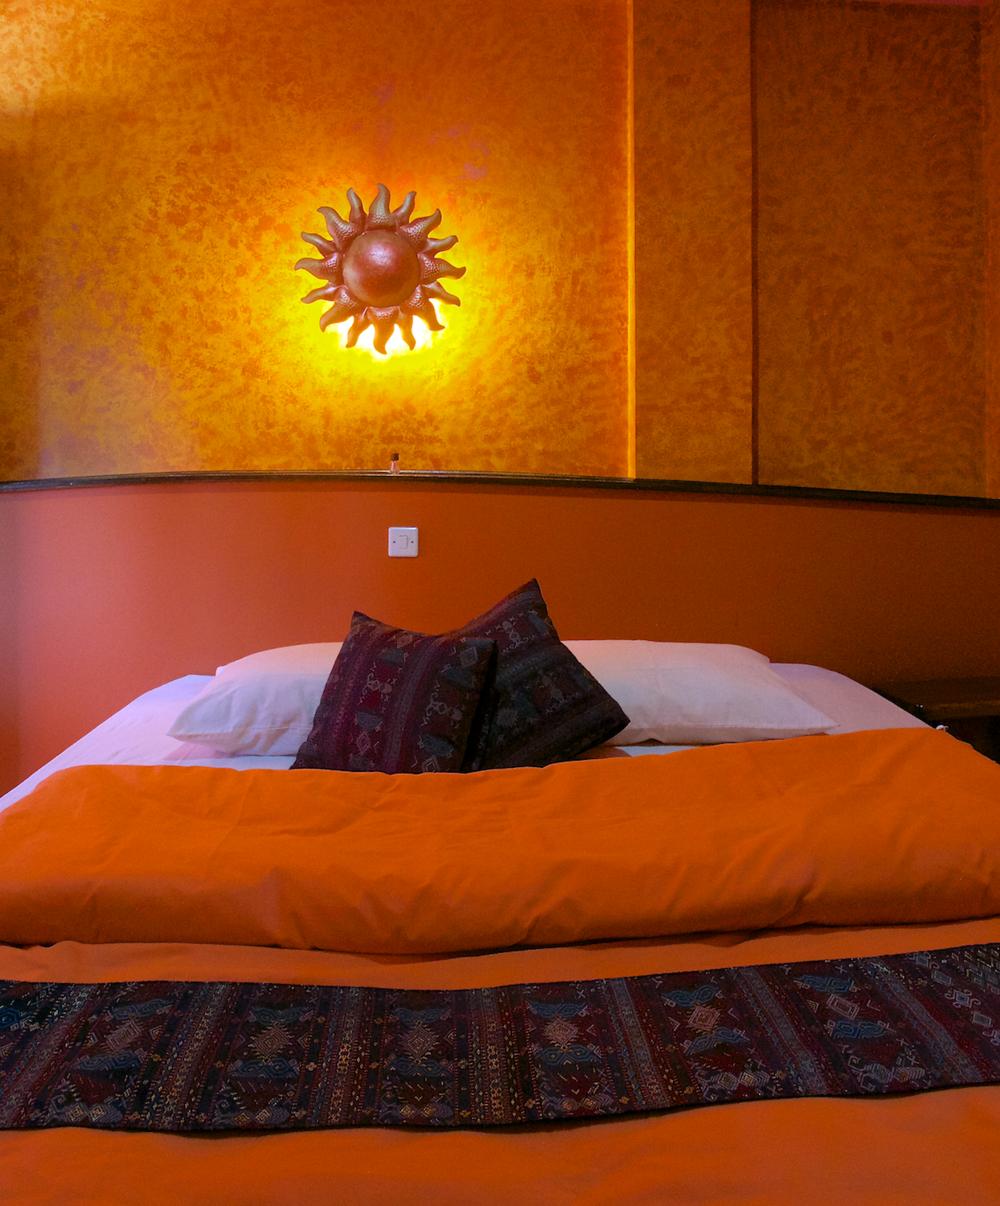 Hotel La Hasienda, Kupang, NTT, Indonesia. Photo © Basil Rolandsen